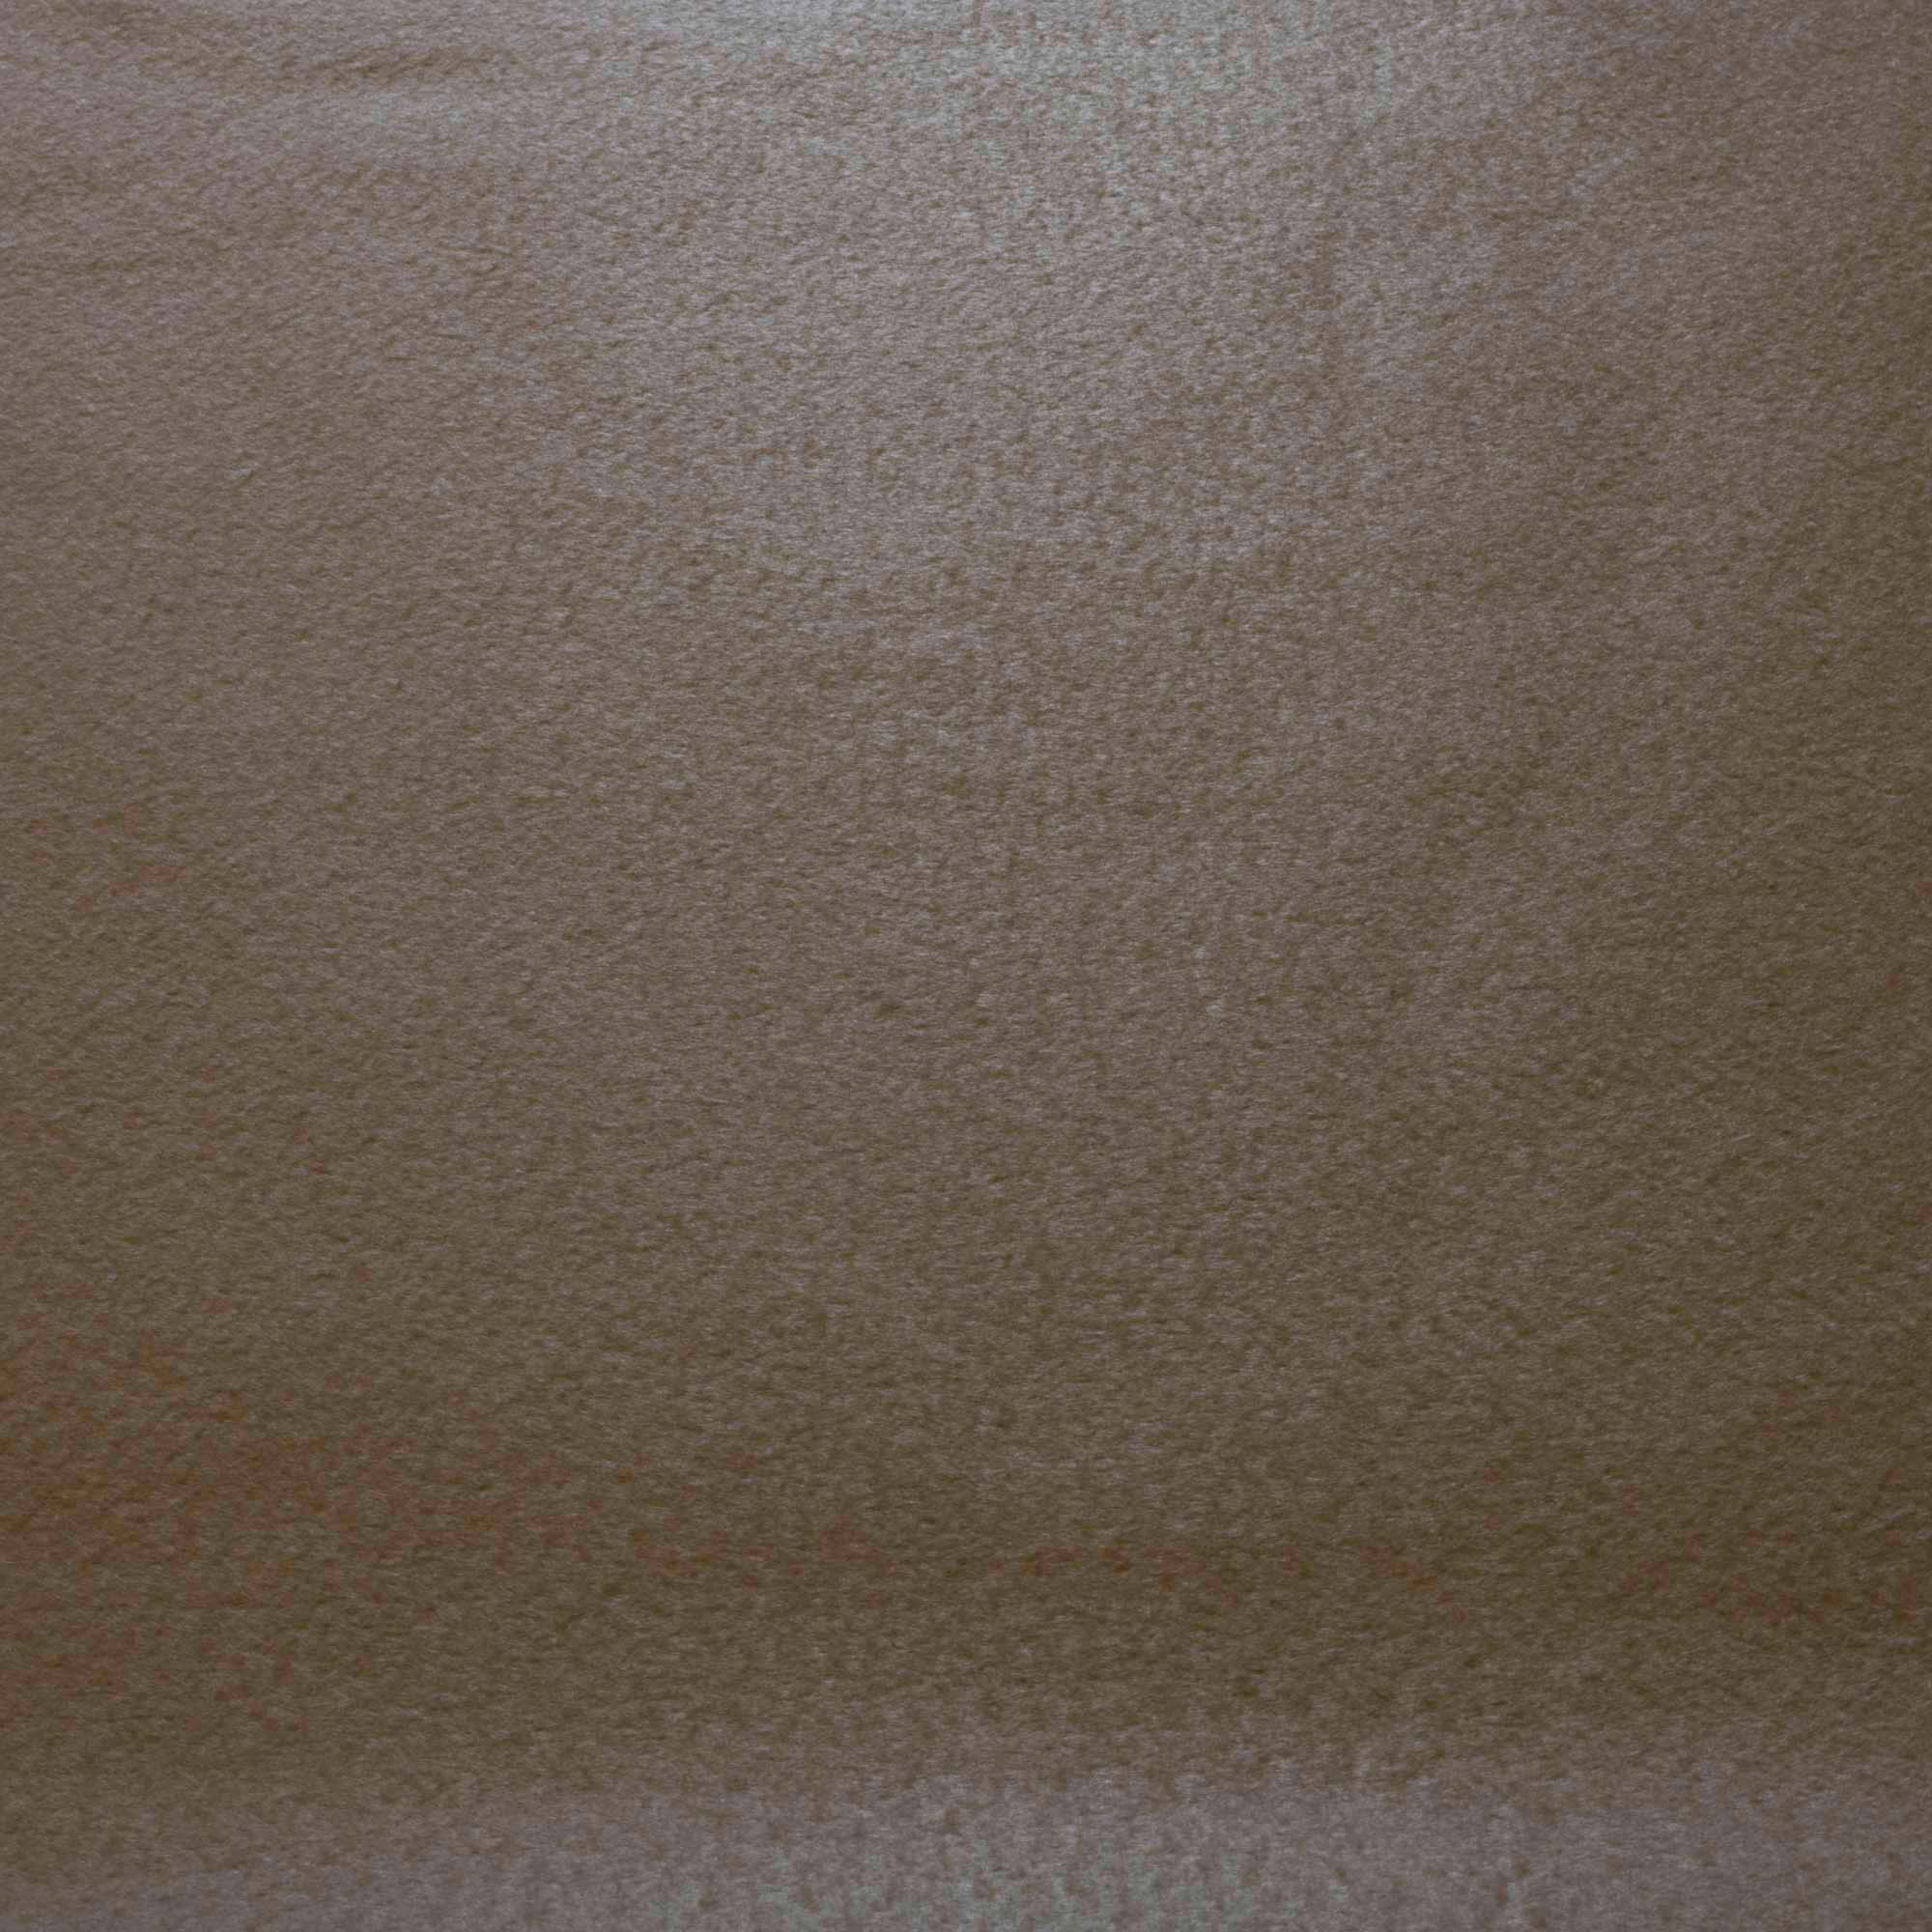 Tecido Feltro Cinza Claro 100% Poliester 1,40 m Largura